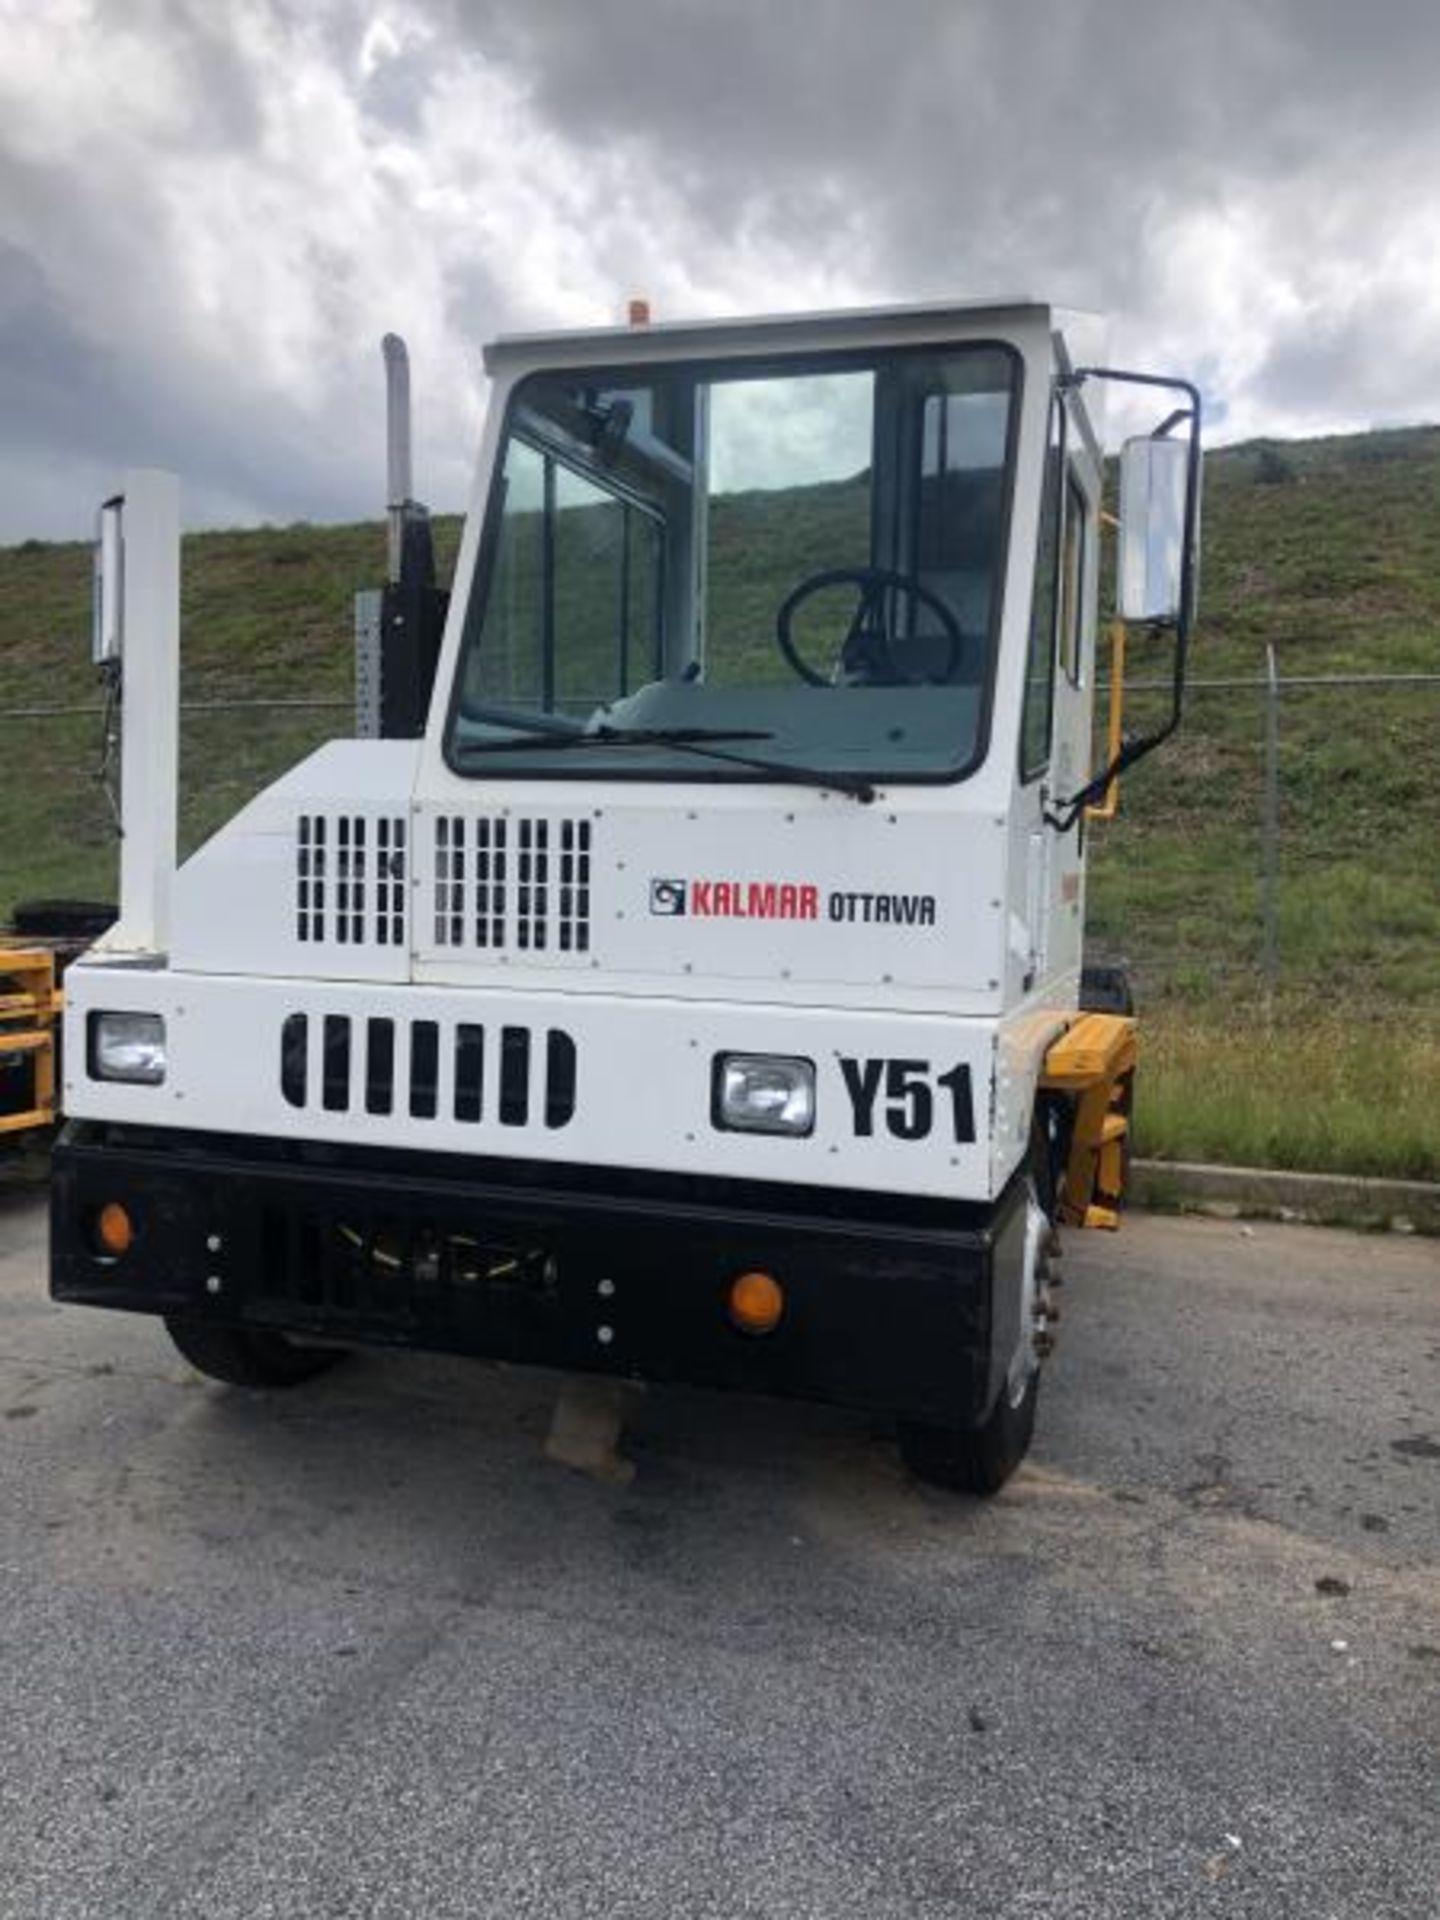 2015 Kalmar Ottawa 4x2 Yard Truck , SN: 338845 2,600.5 Hours, 185 Miles - Image 27 of 27